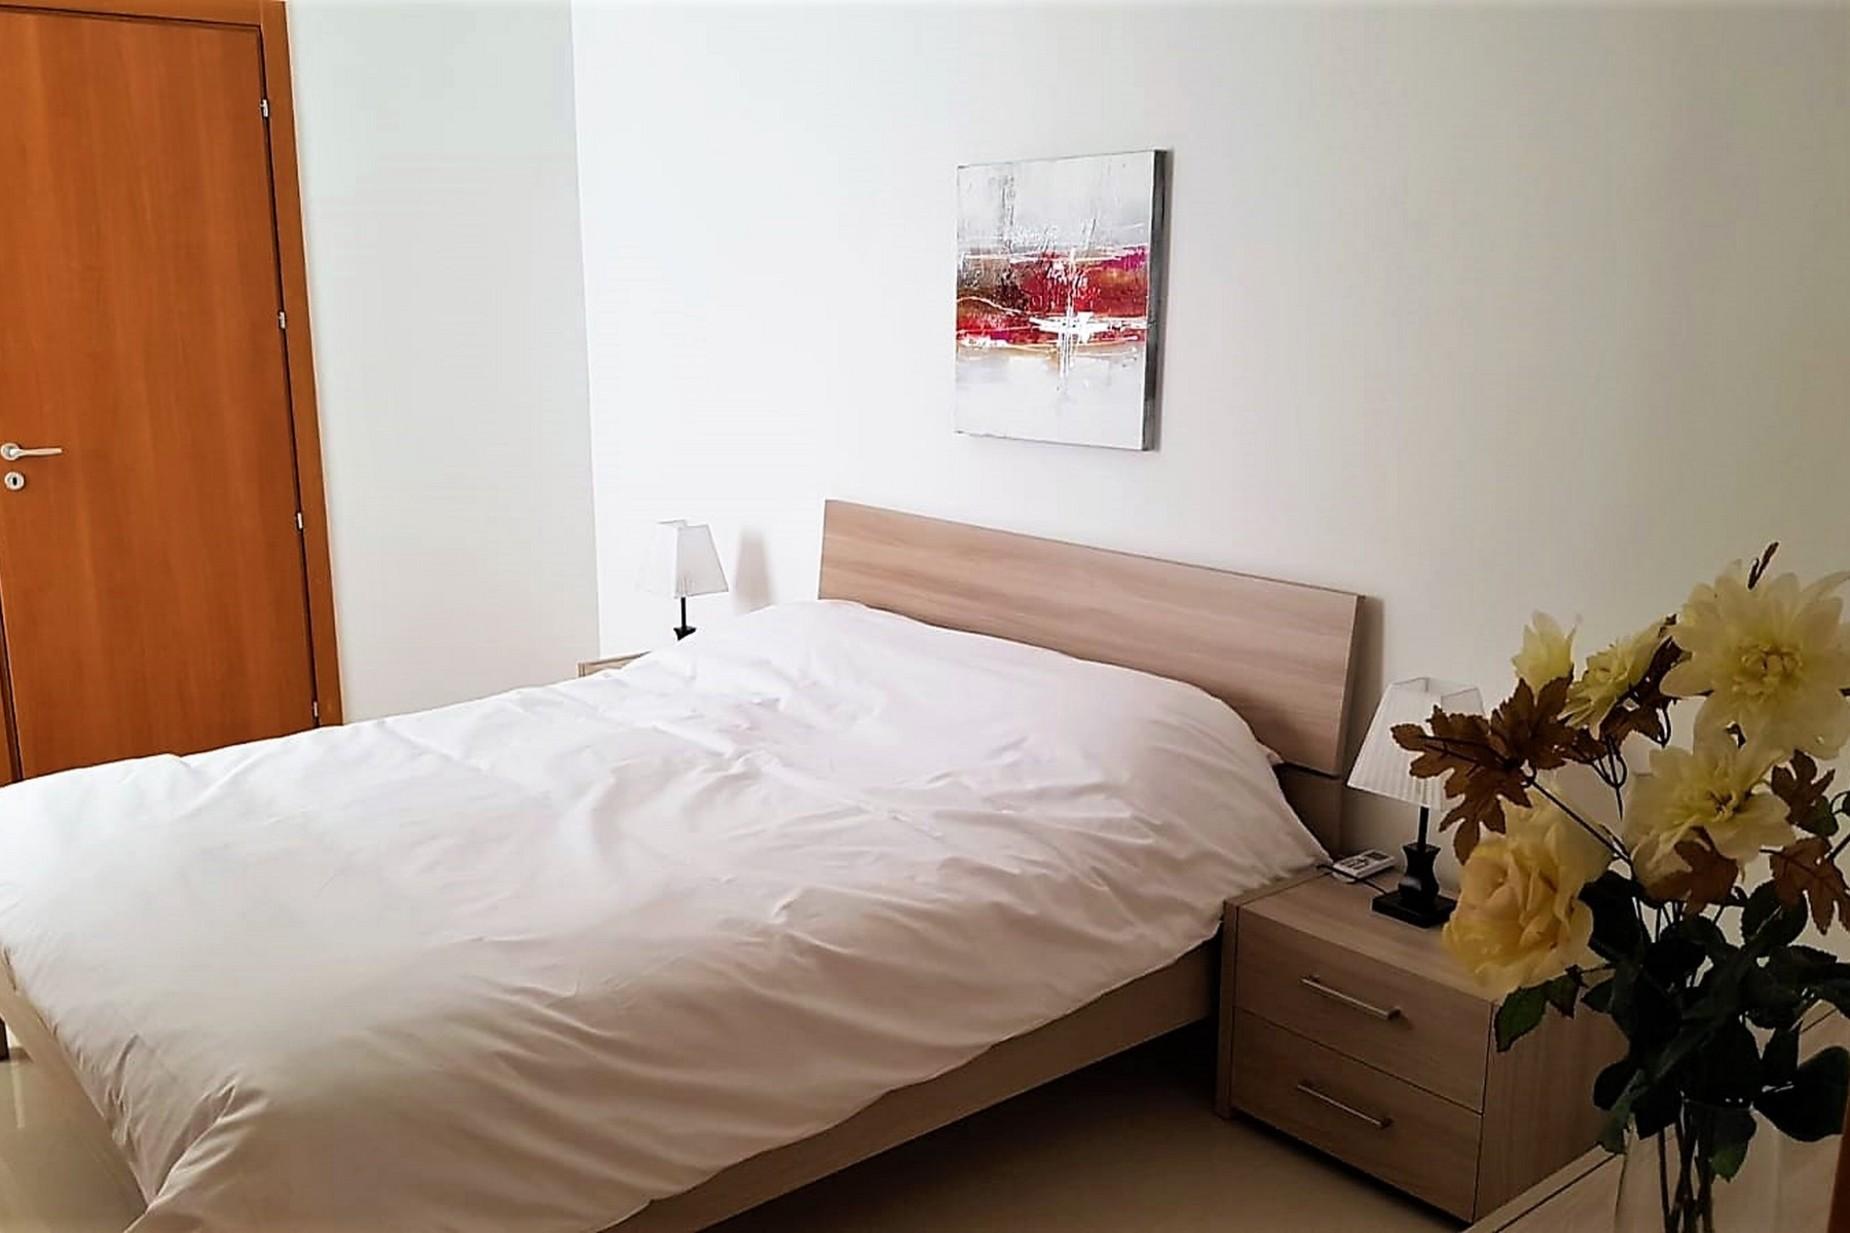 3 bed Apartment For Rent in Zebbug, Zebbug - thumb 4